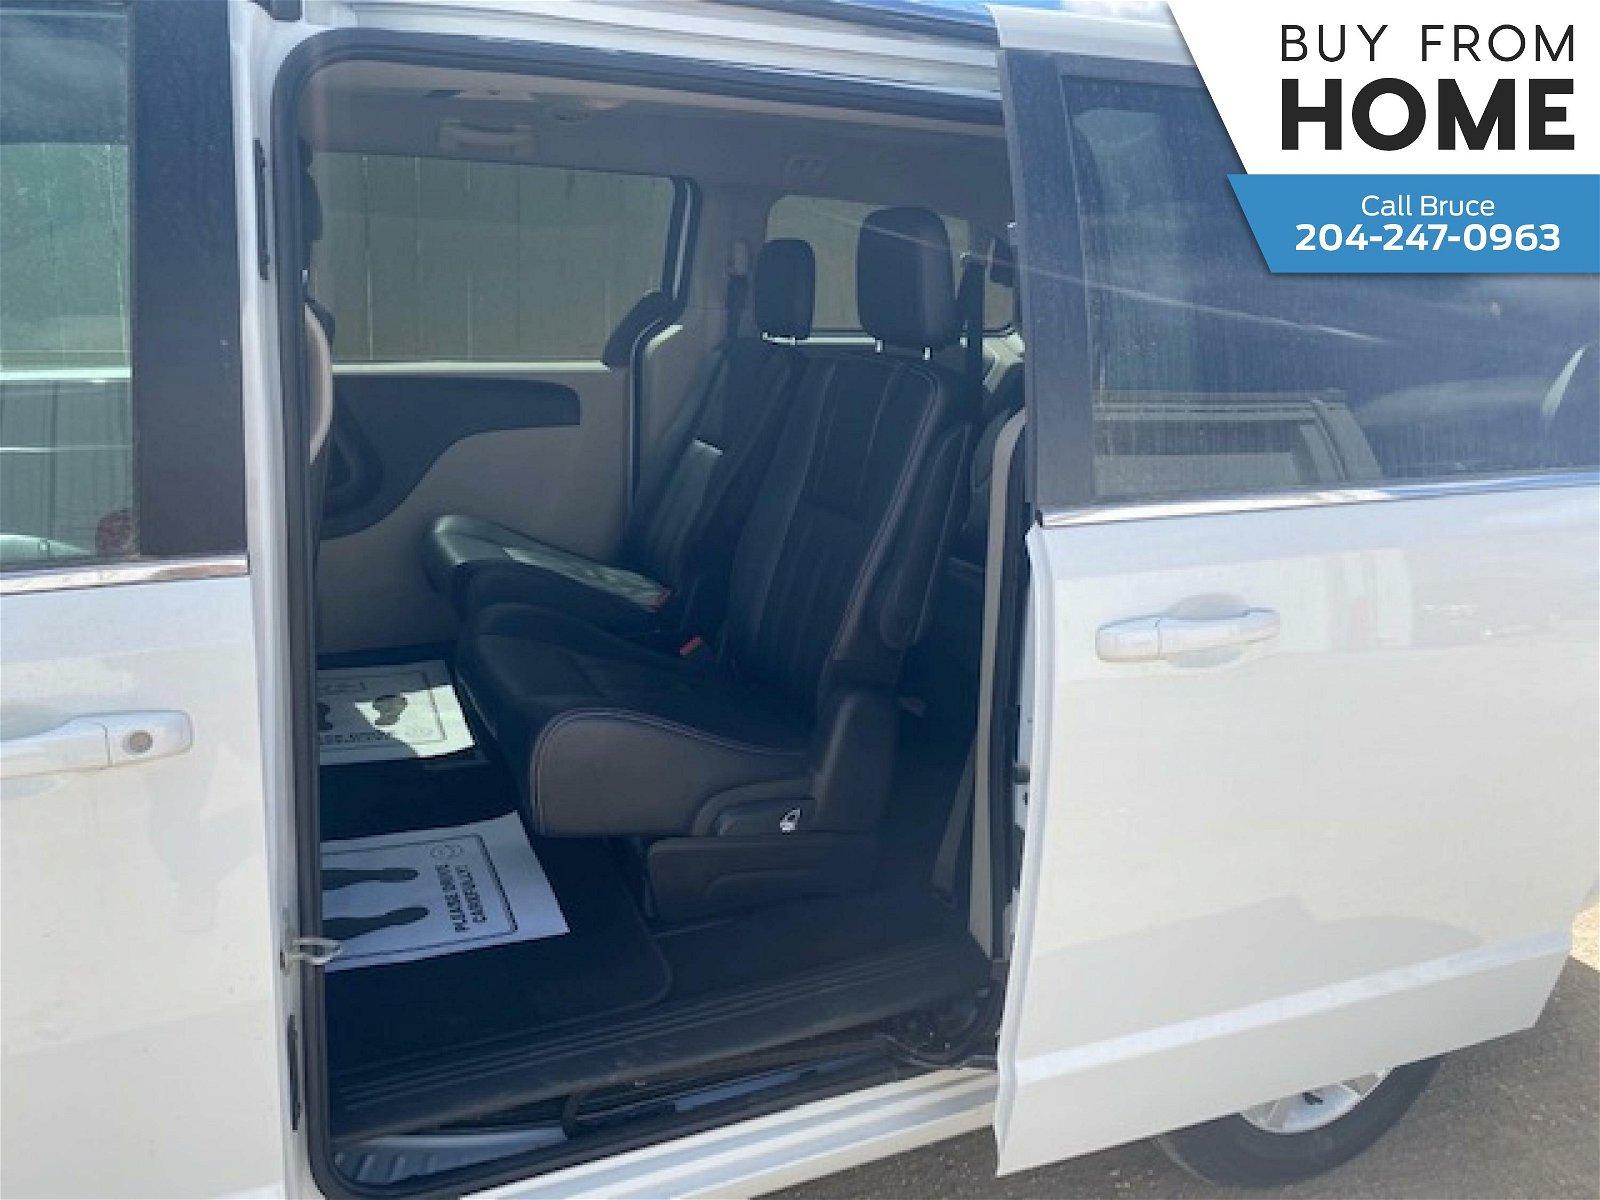 2019 Dodge Grand Caravan Crew Plus